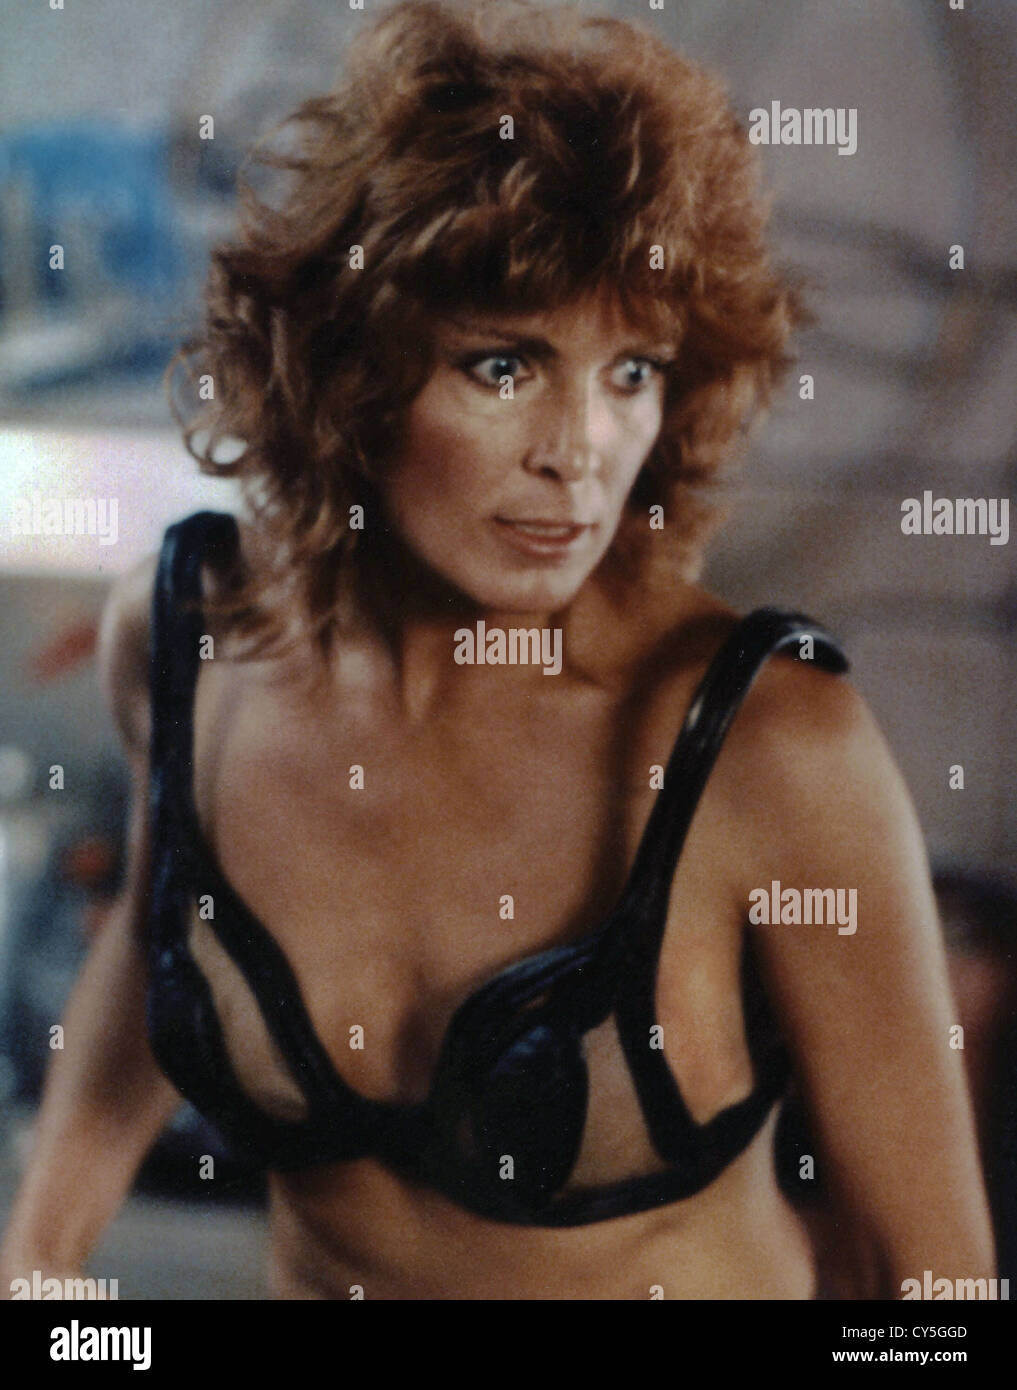 BLADE RUNNER (1982) JOANNA CASSIDY RIDLEY SCOTT (DIR) 034 MOVIESTORE COLLECTION LTD - Stock Image